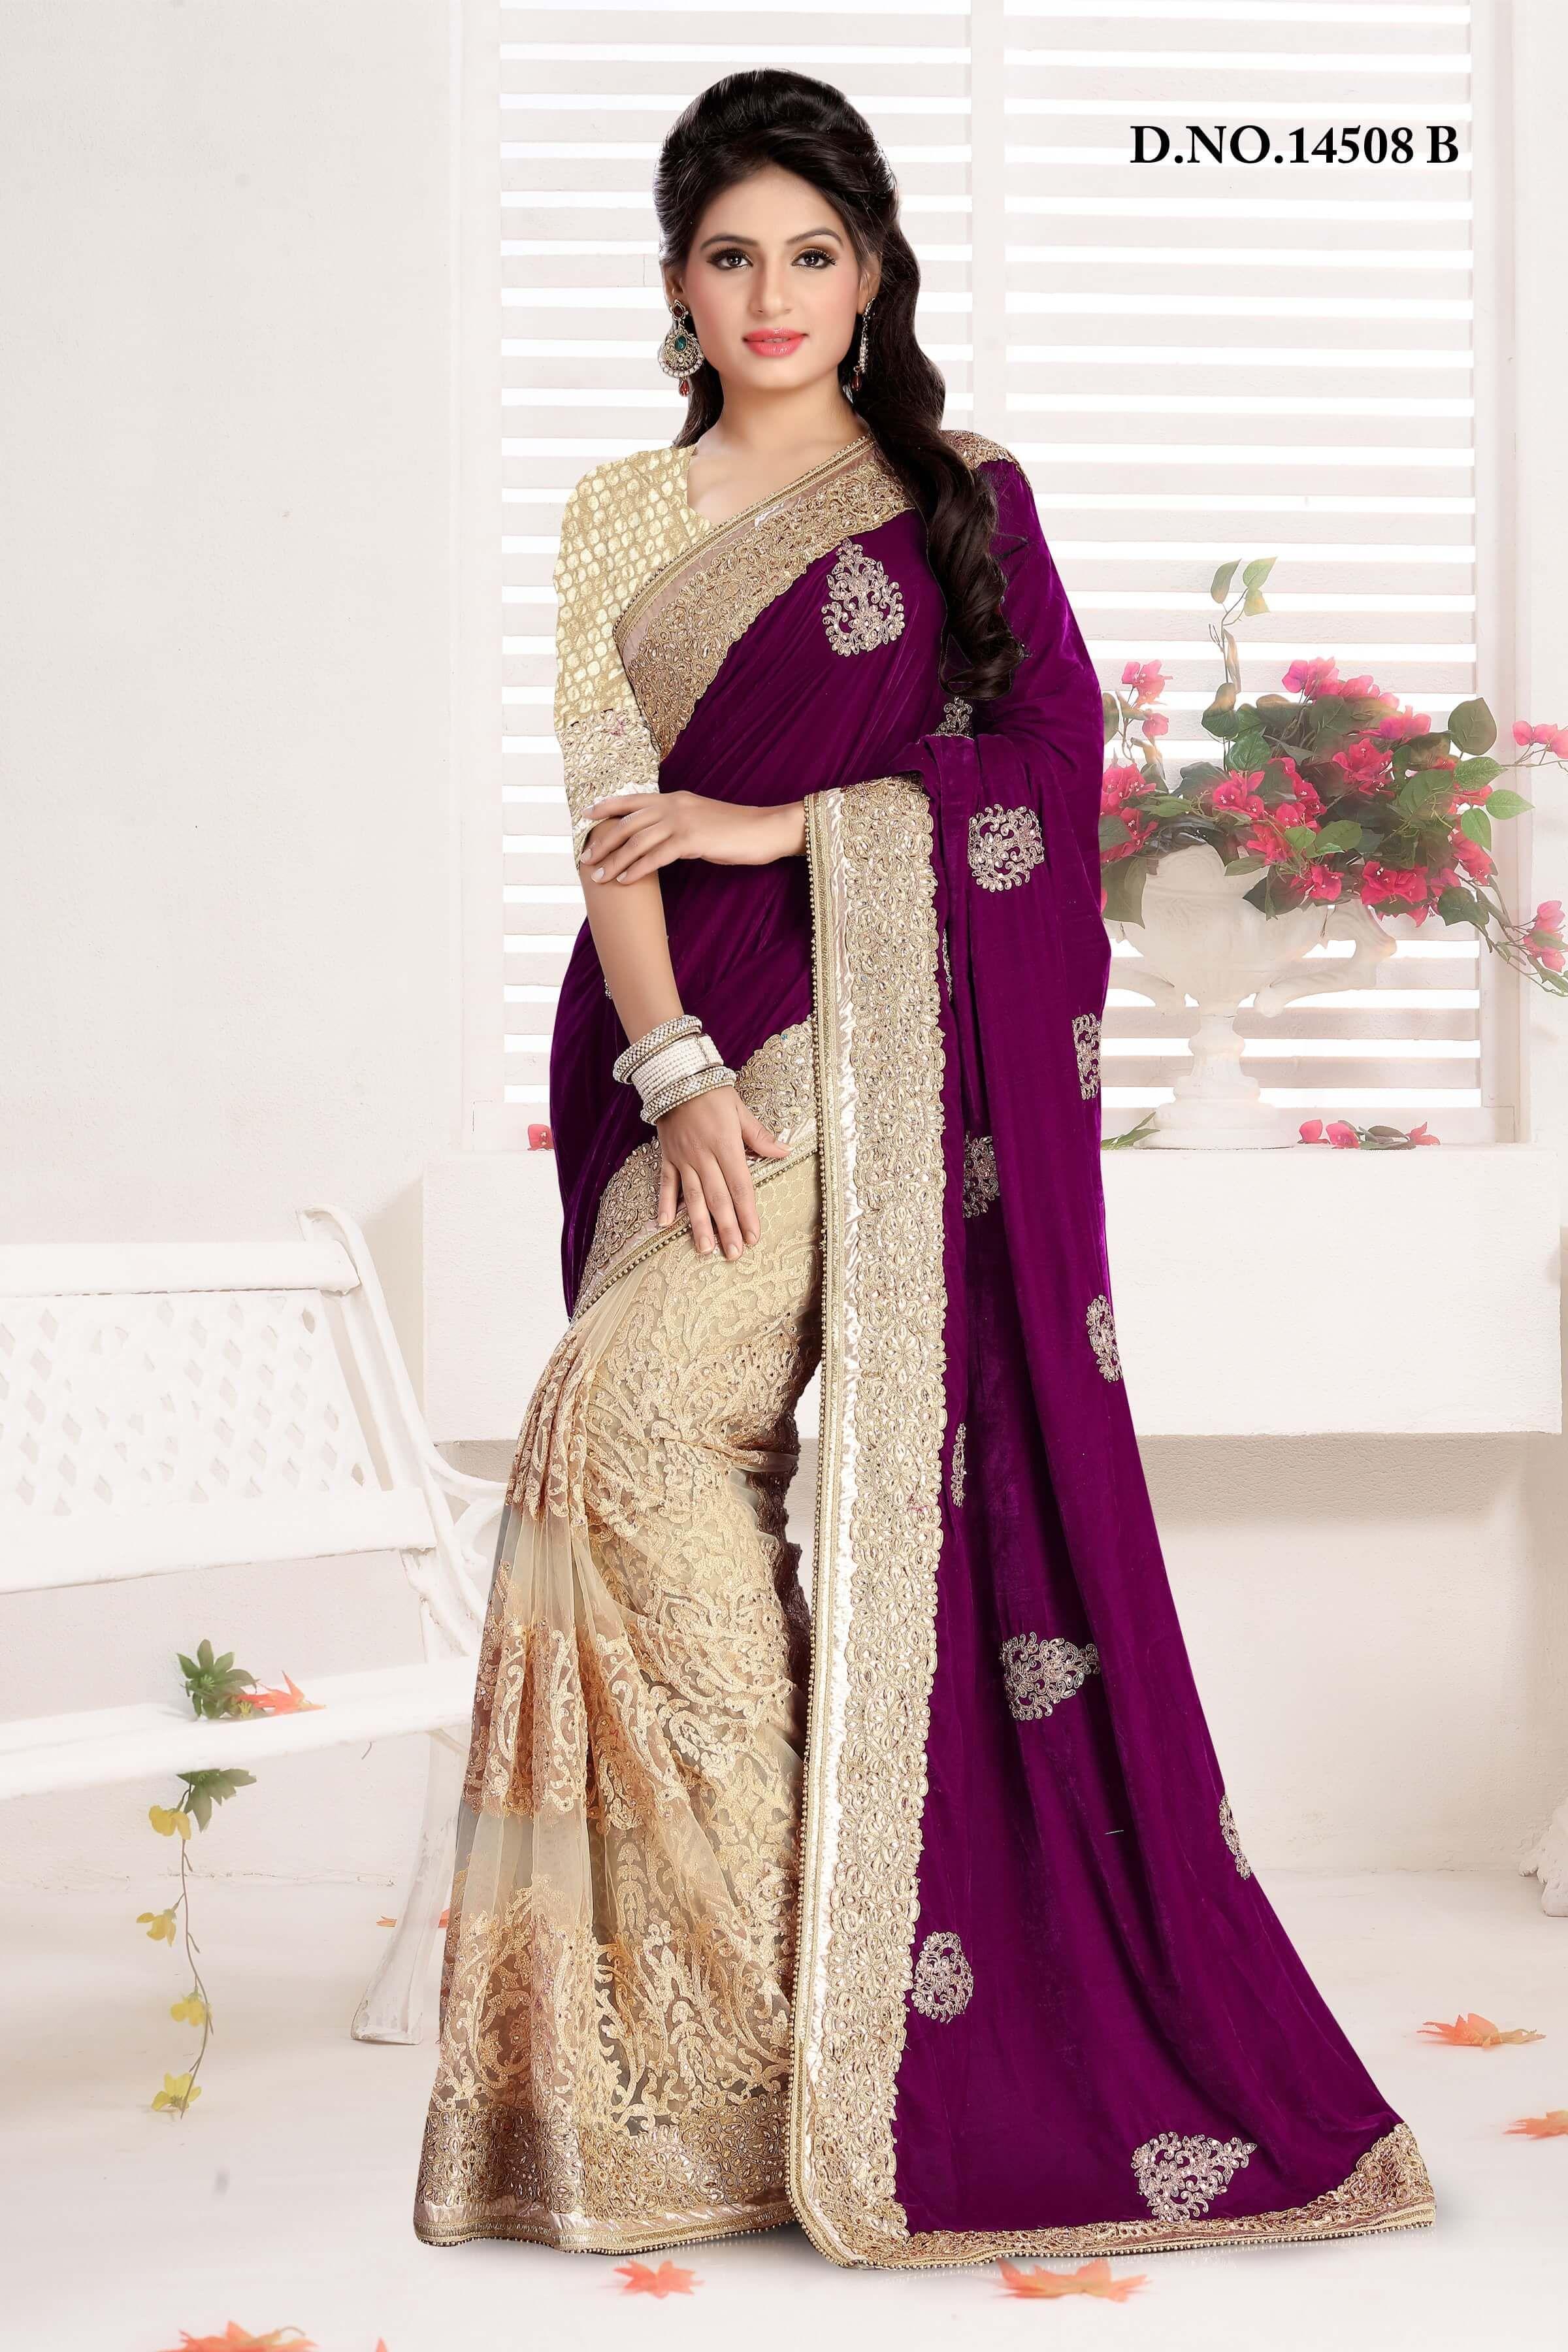 Velvet saree images pin by parvatifabrics pvt lmt on non catalogue sarees  pinterest